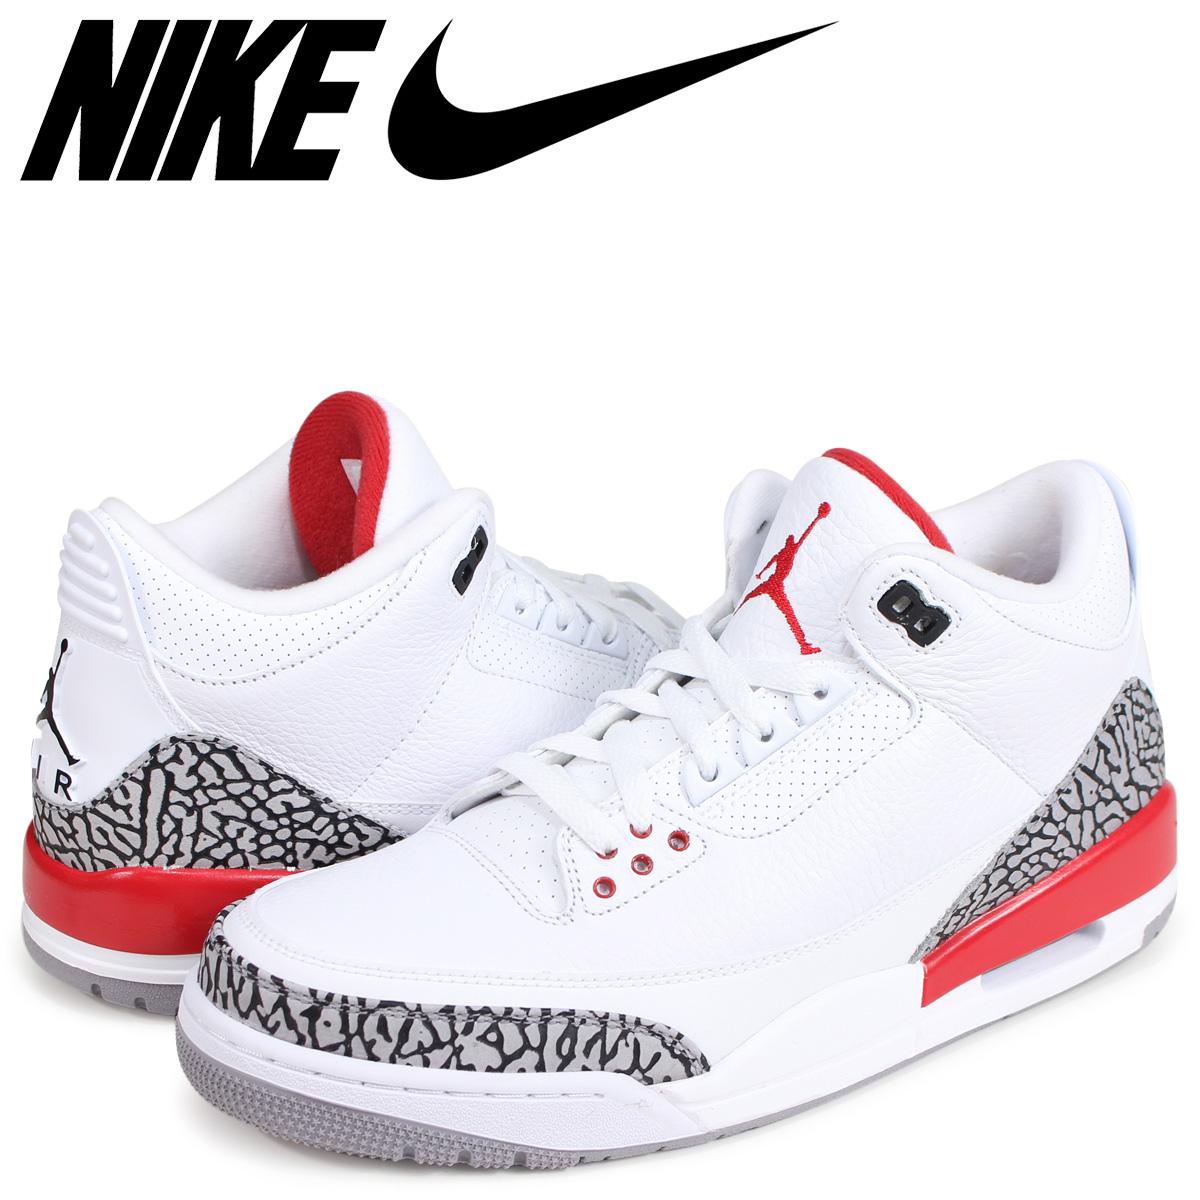 e398caacbfc492 Whats up Sports  NIKE AIR JORDAN 3 RETRO KATRINA Nike Air Jordan 3  nostalgic sneakers men 136